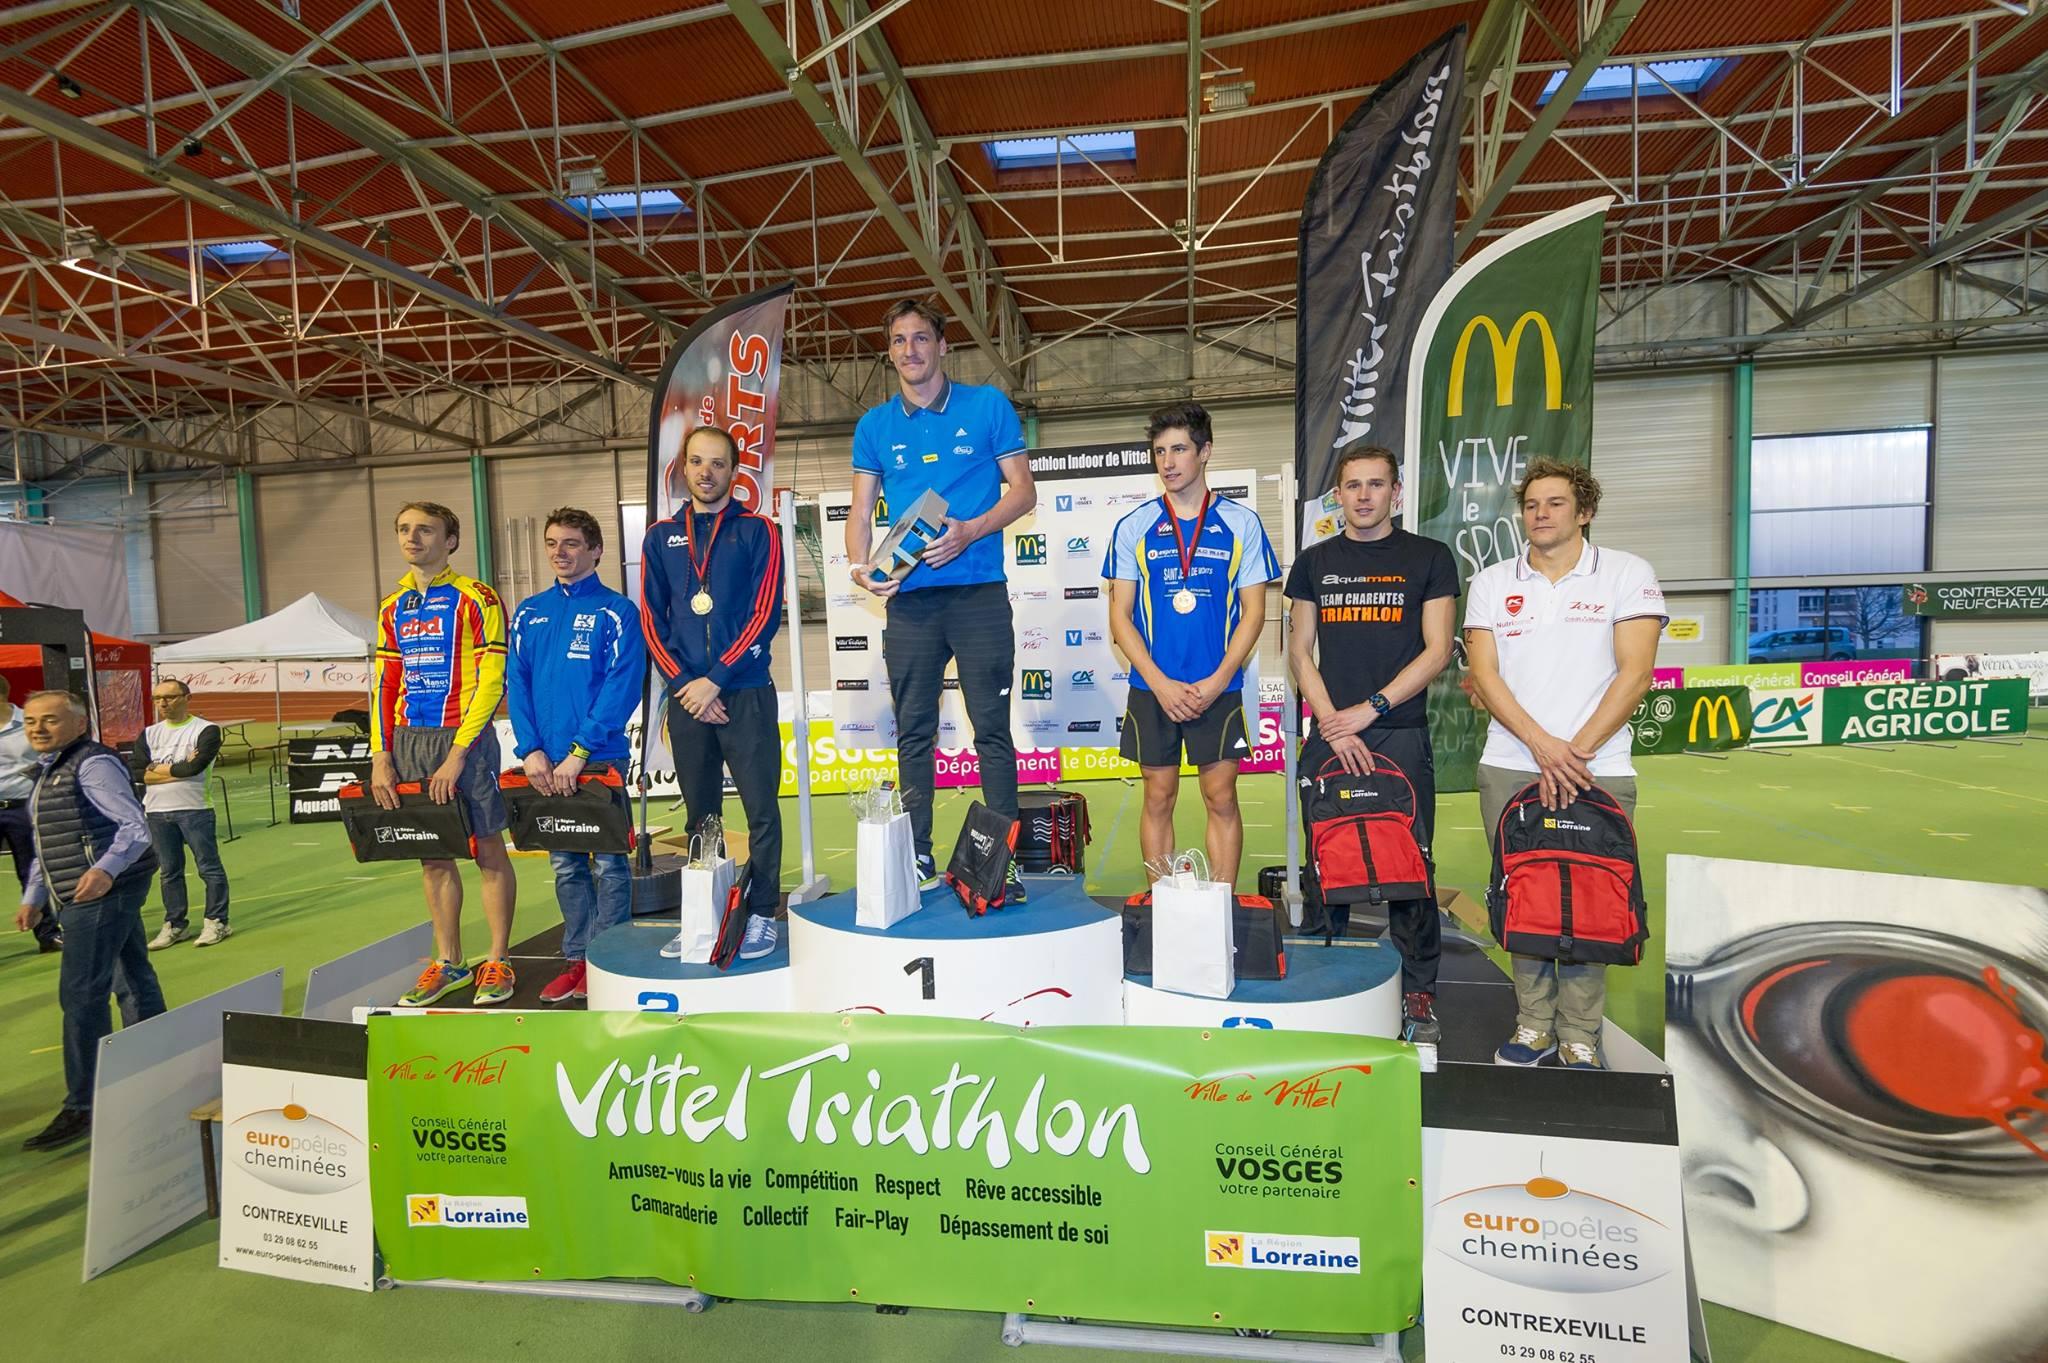 Aquathlon de Vittel: tous les résultats